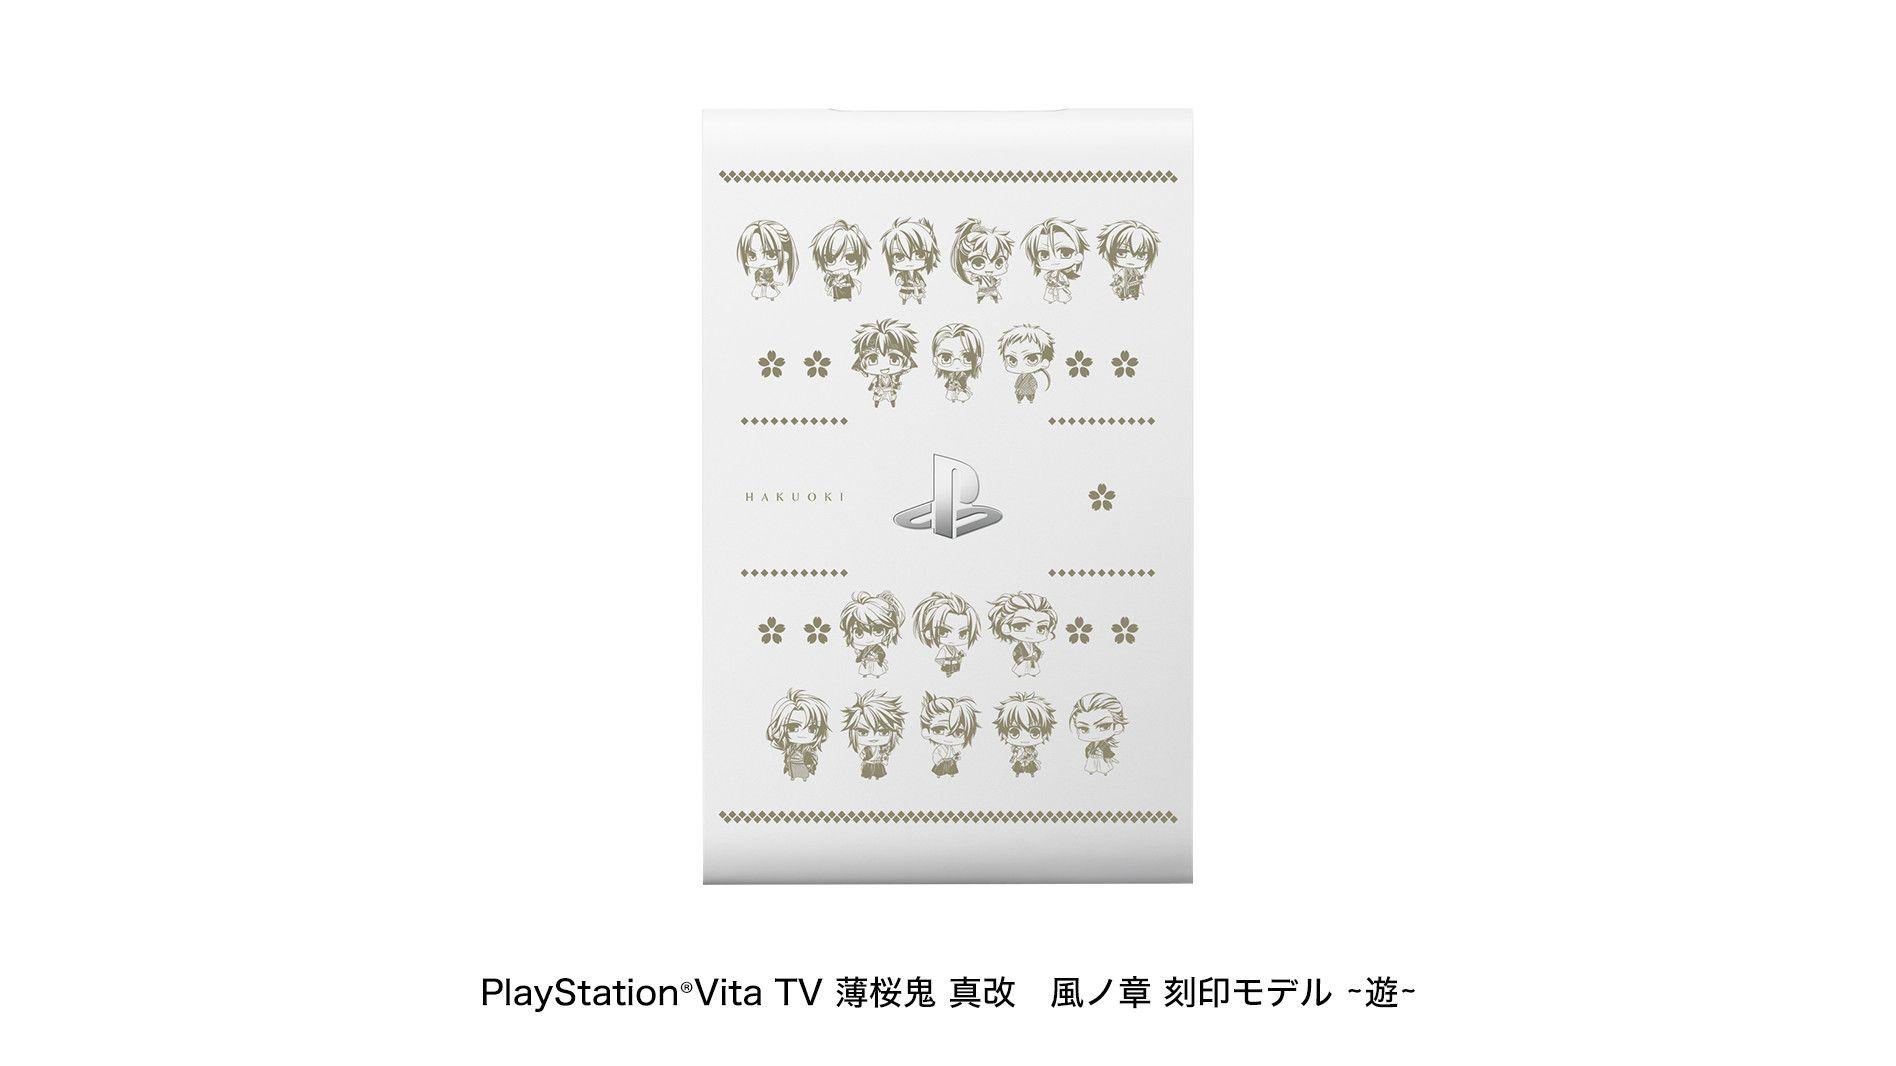 Gallery_hakuoki_shinkai_VitaTV2_1